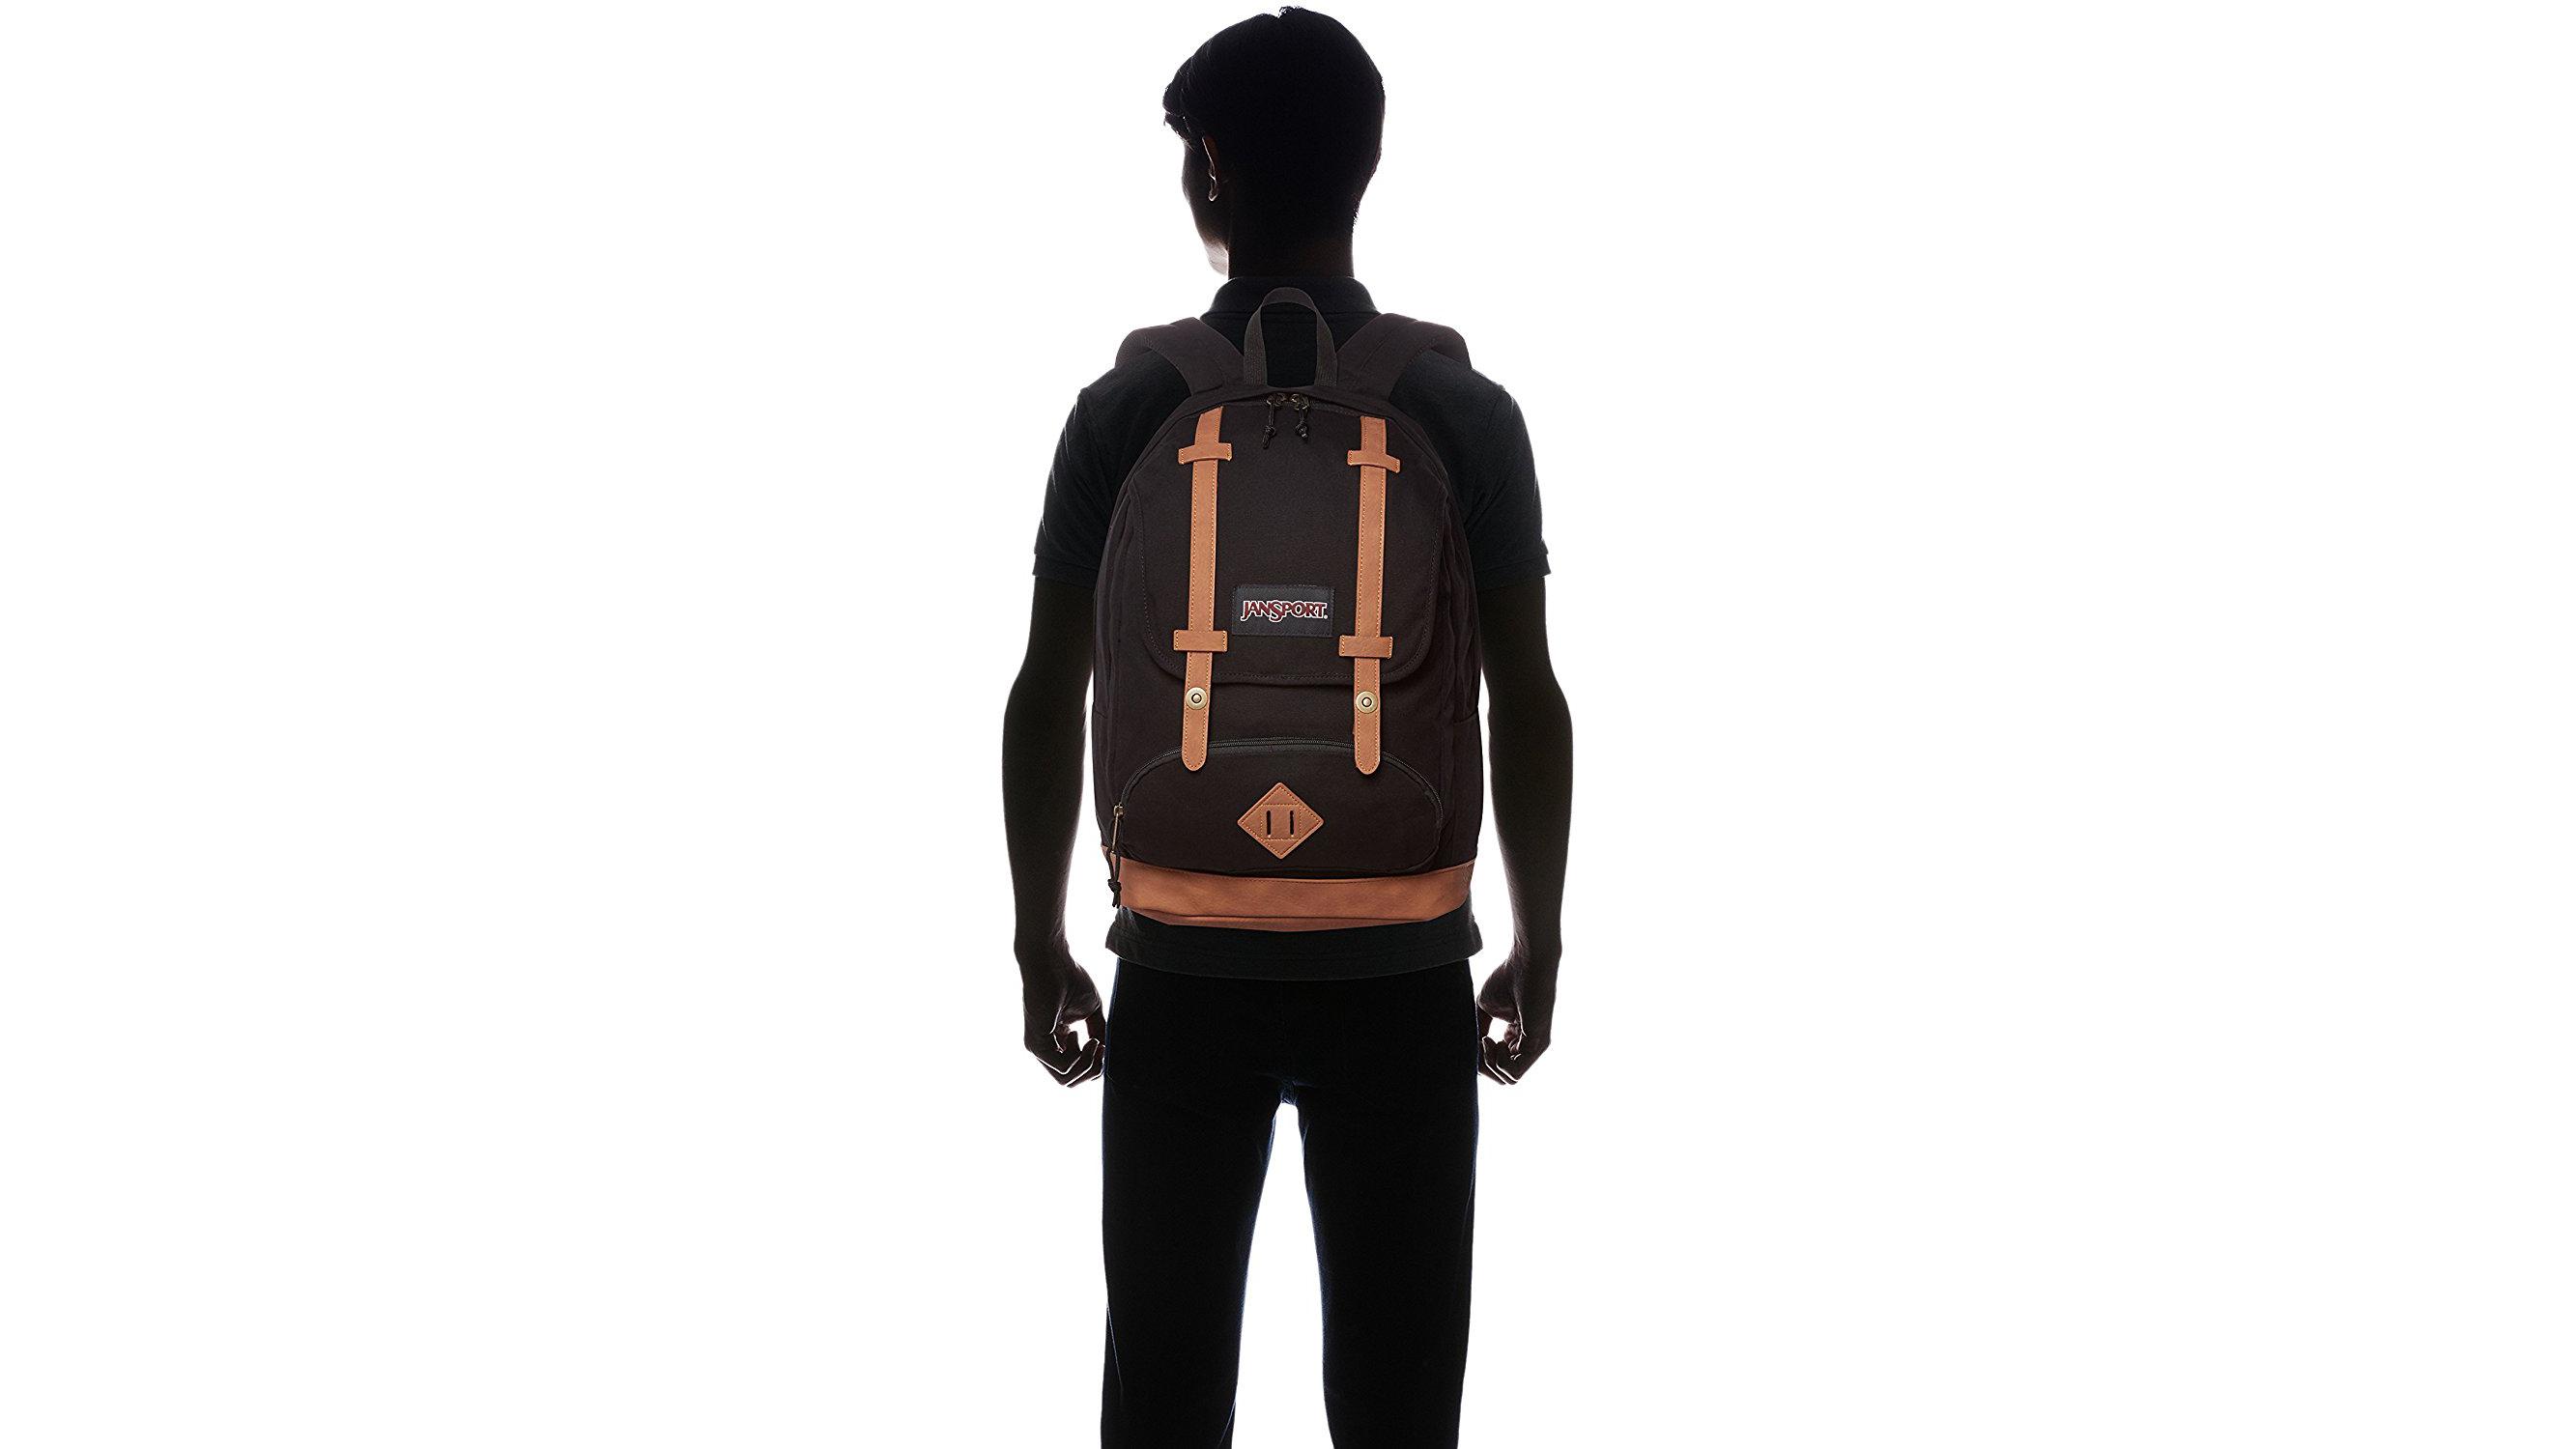 DbyvTkbG7bbyp4fPkXKyhC - The 5 best back to school backpacks for 2019